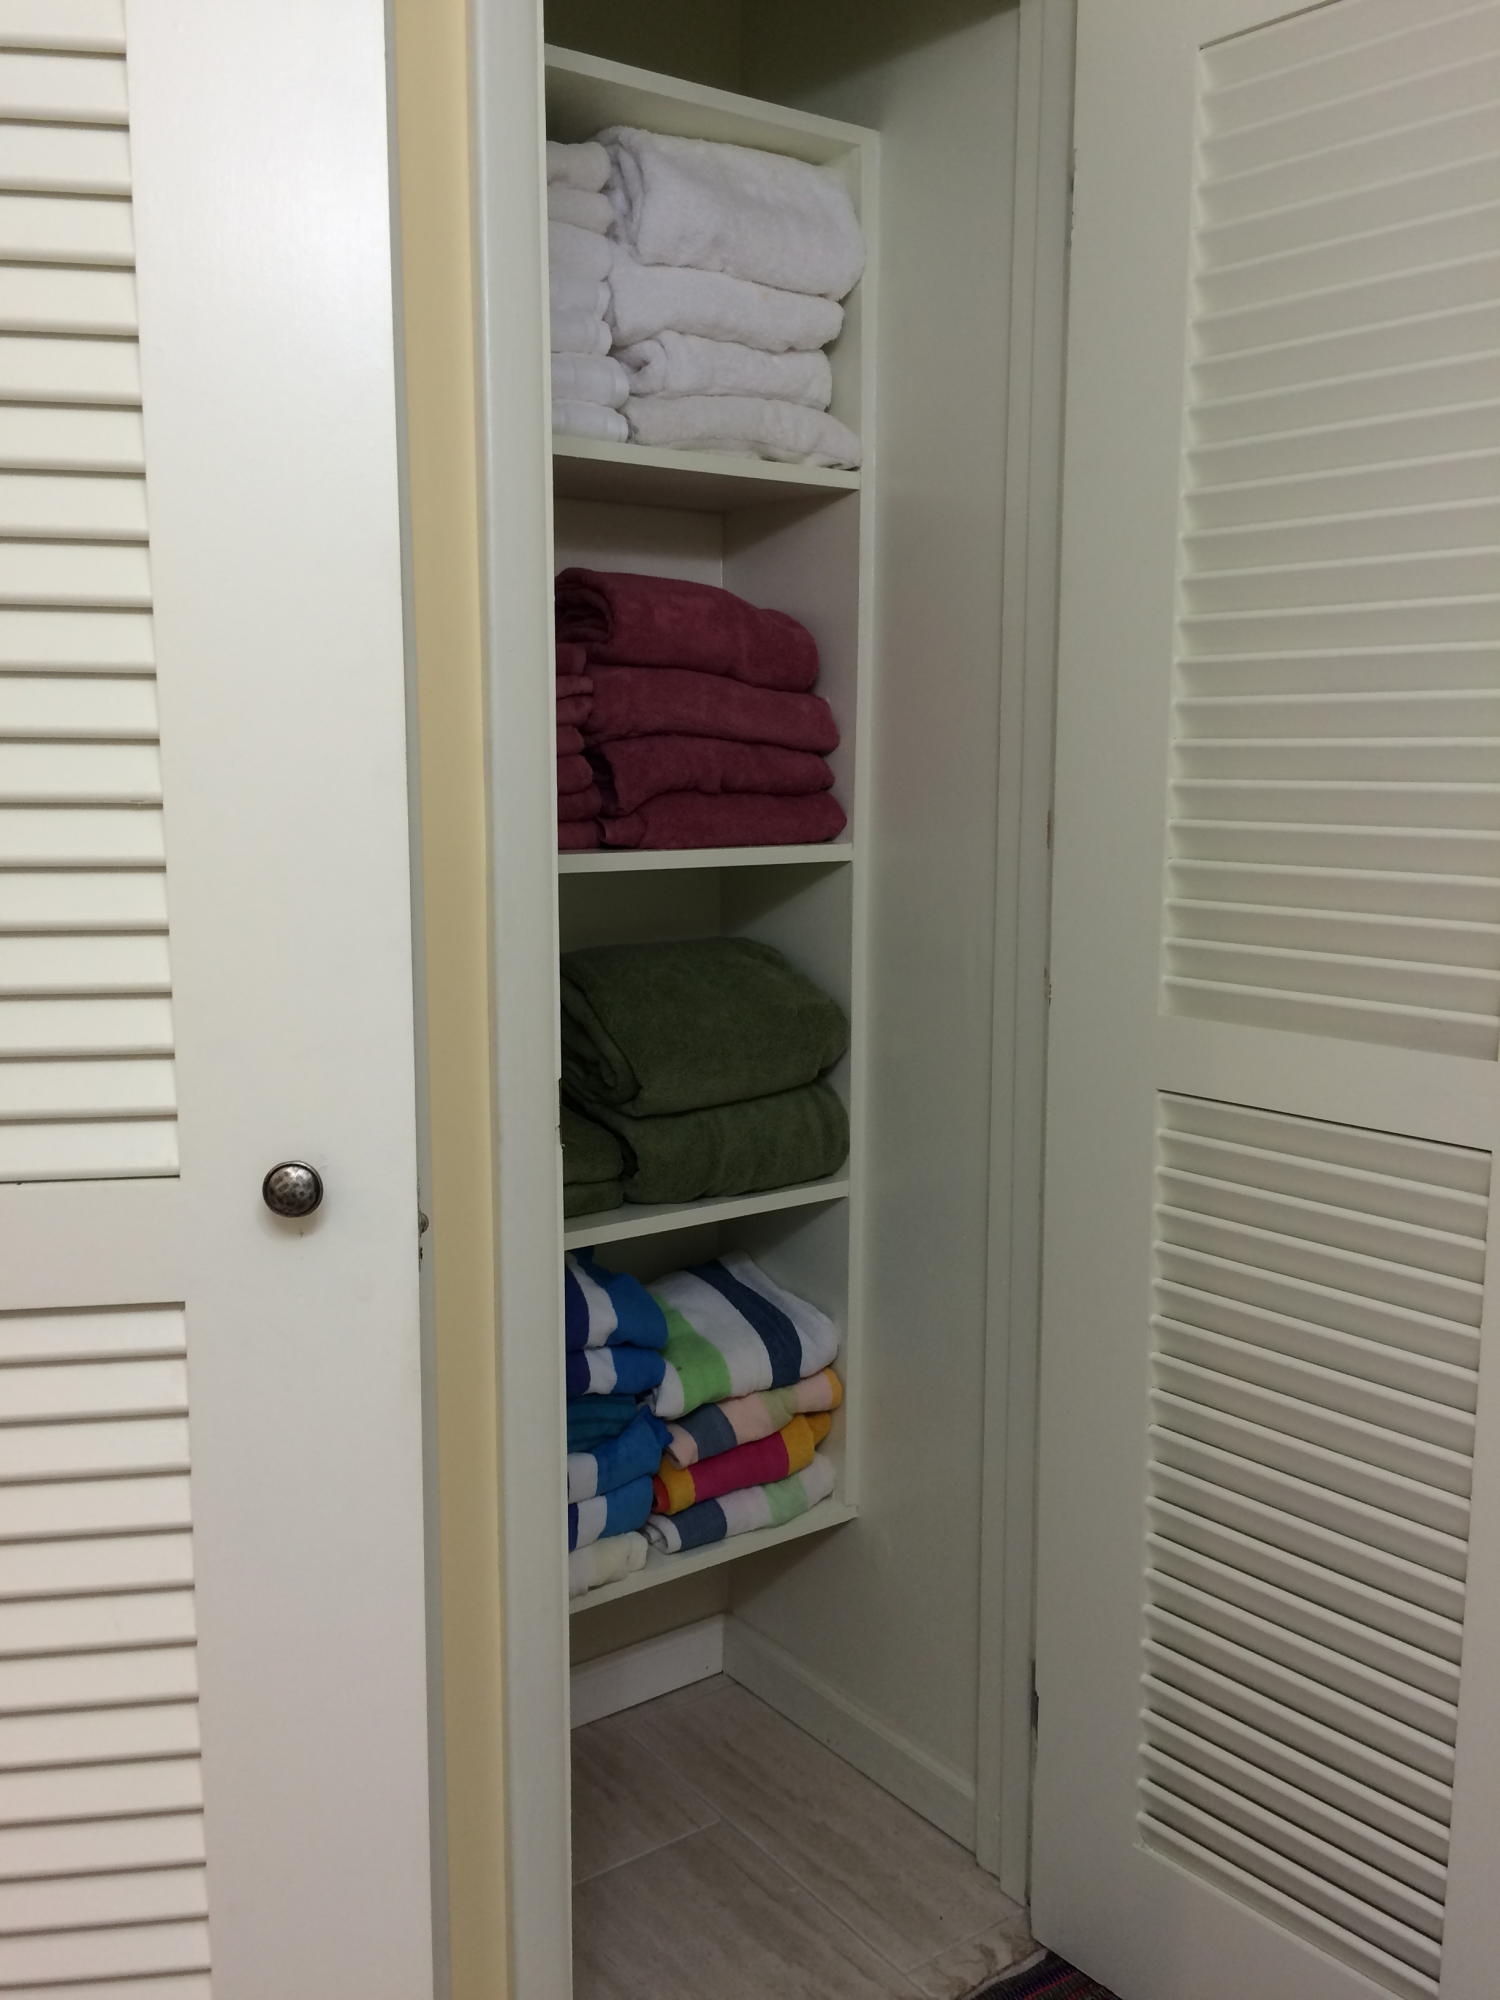 Guest Bathroom - Linen closet